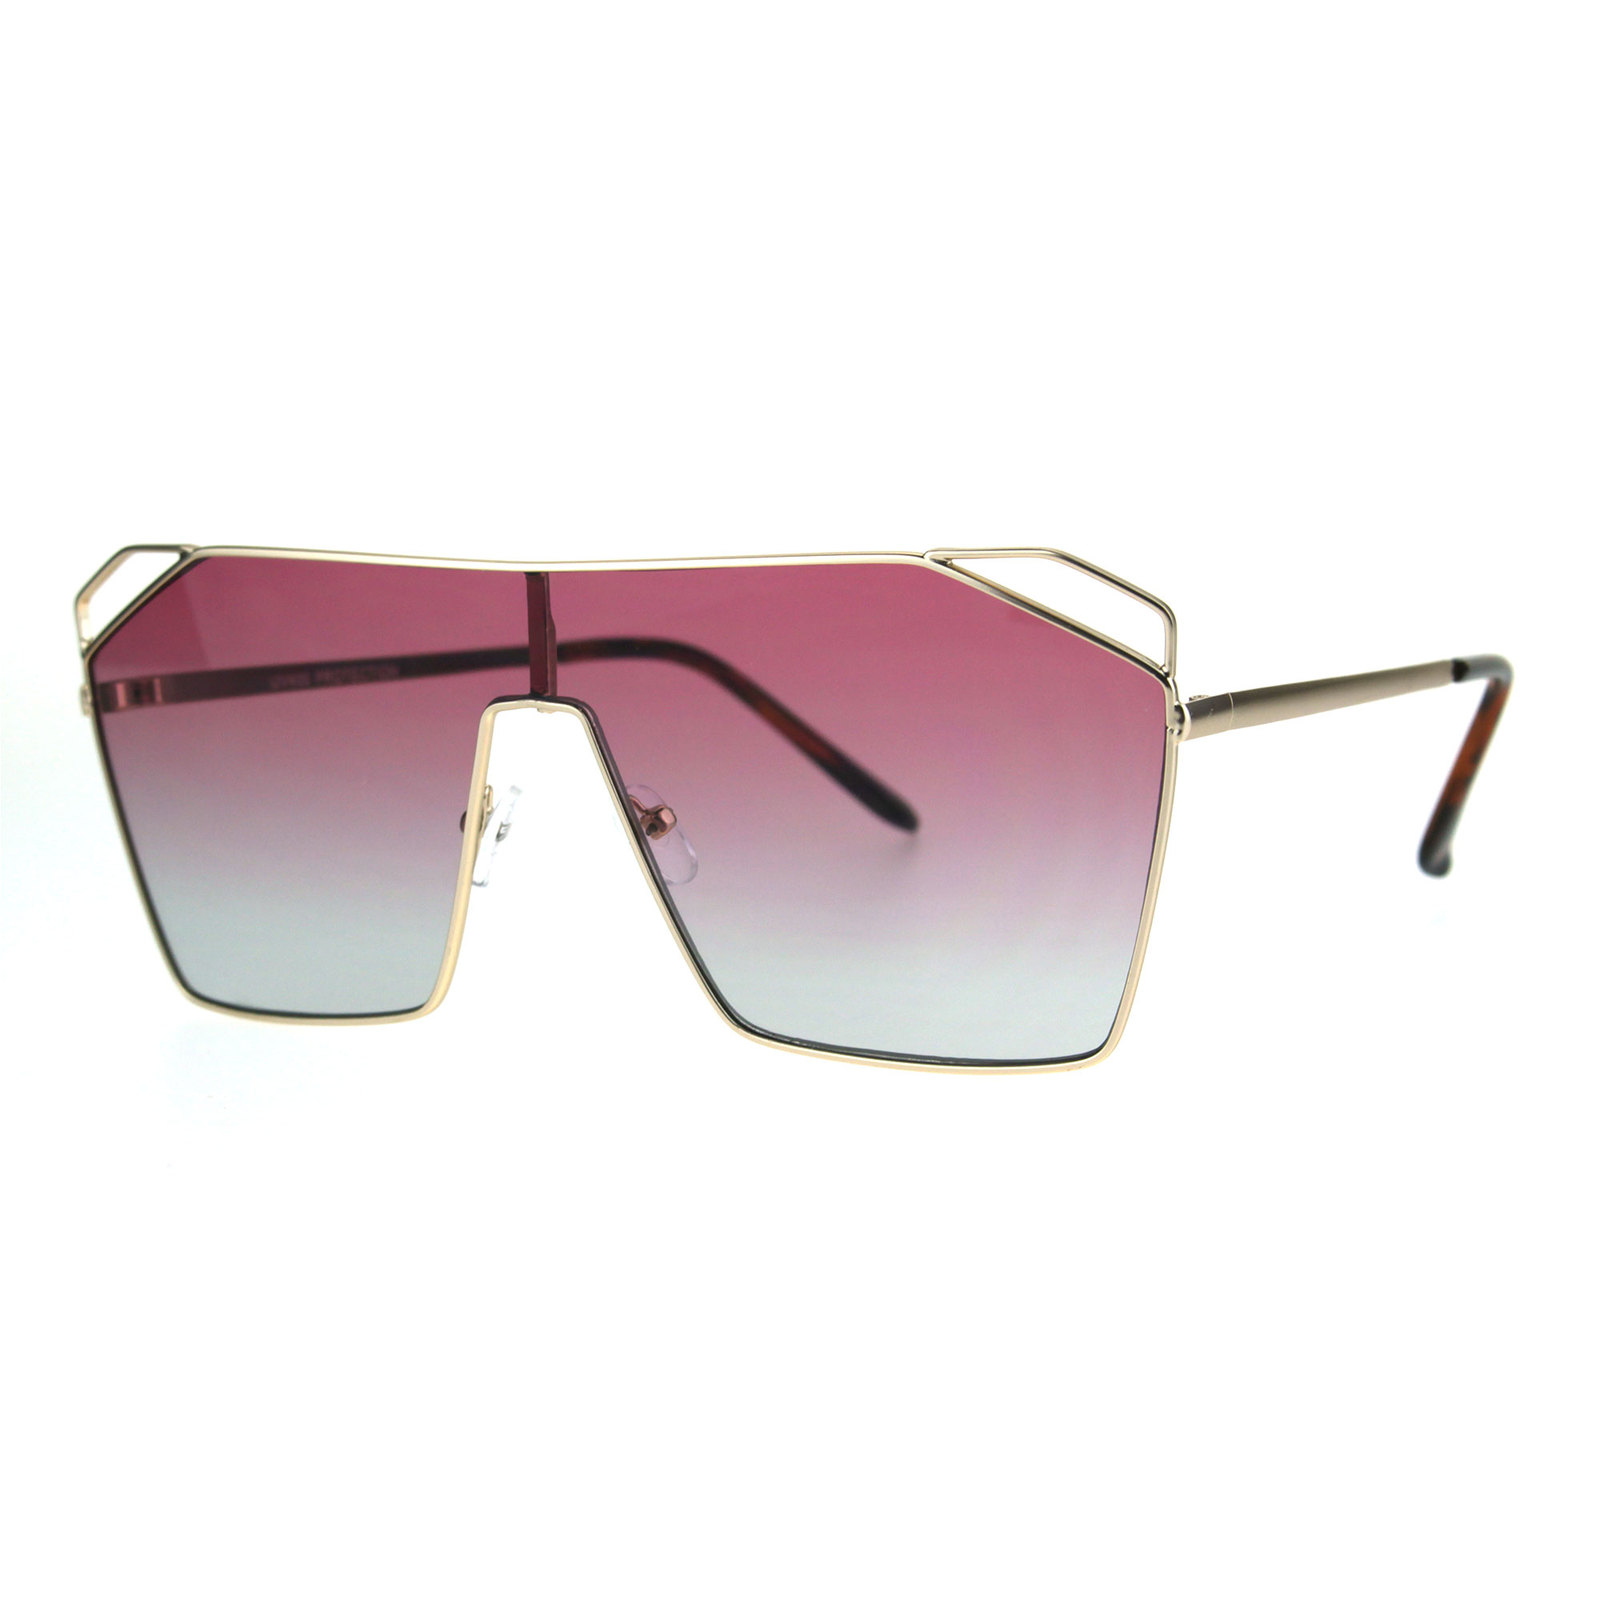 b256d7306b ... Womens Oceanic Gradient Futurist Shield Robotic Metal Aviator Sunglasses  ...